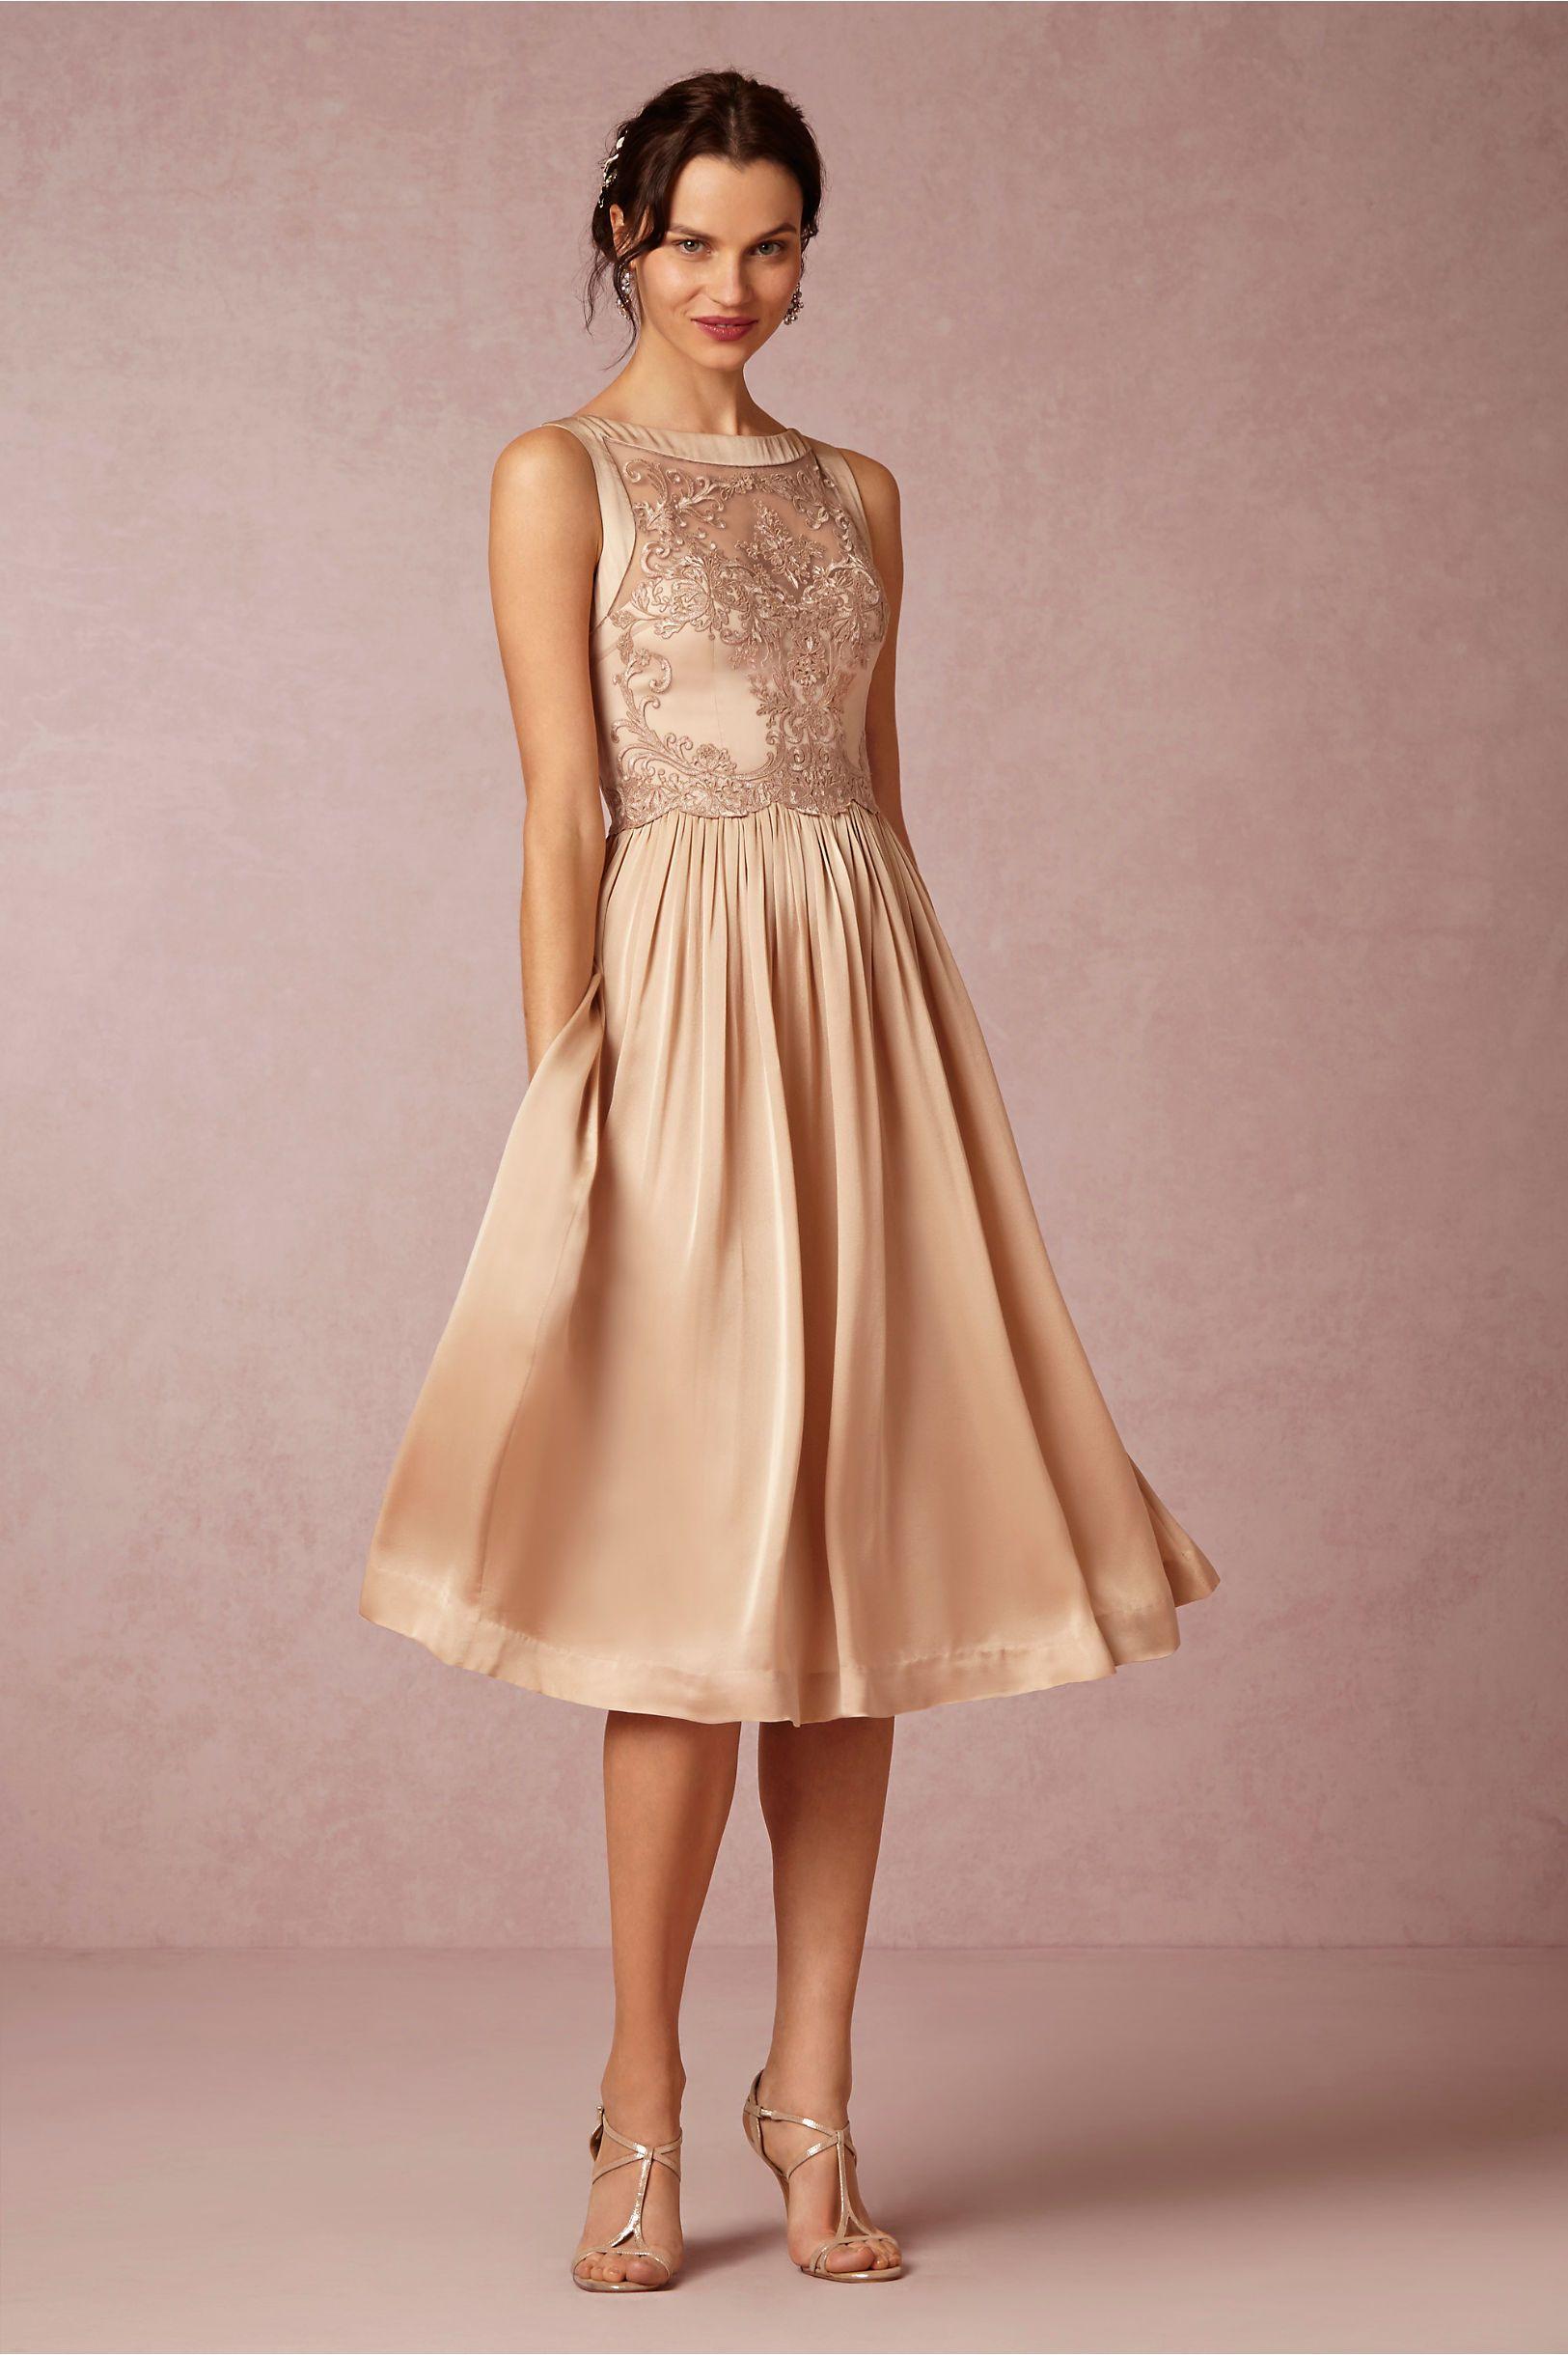 Alma Dress in Bride Wedding Dresses Back Detail at BHLDN | Moda para ...